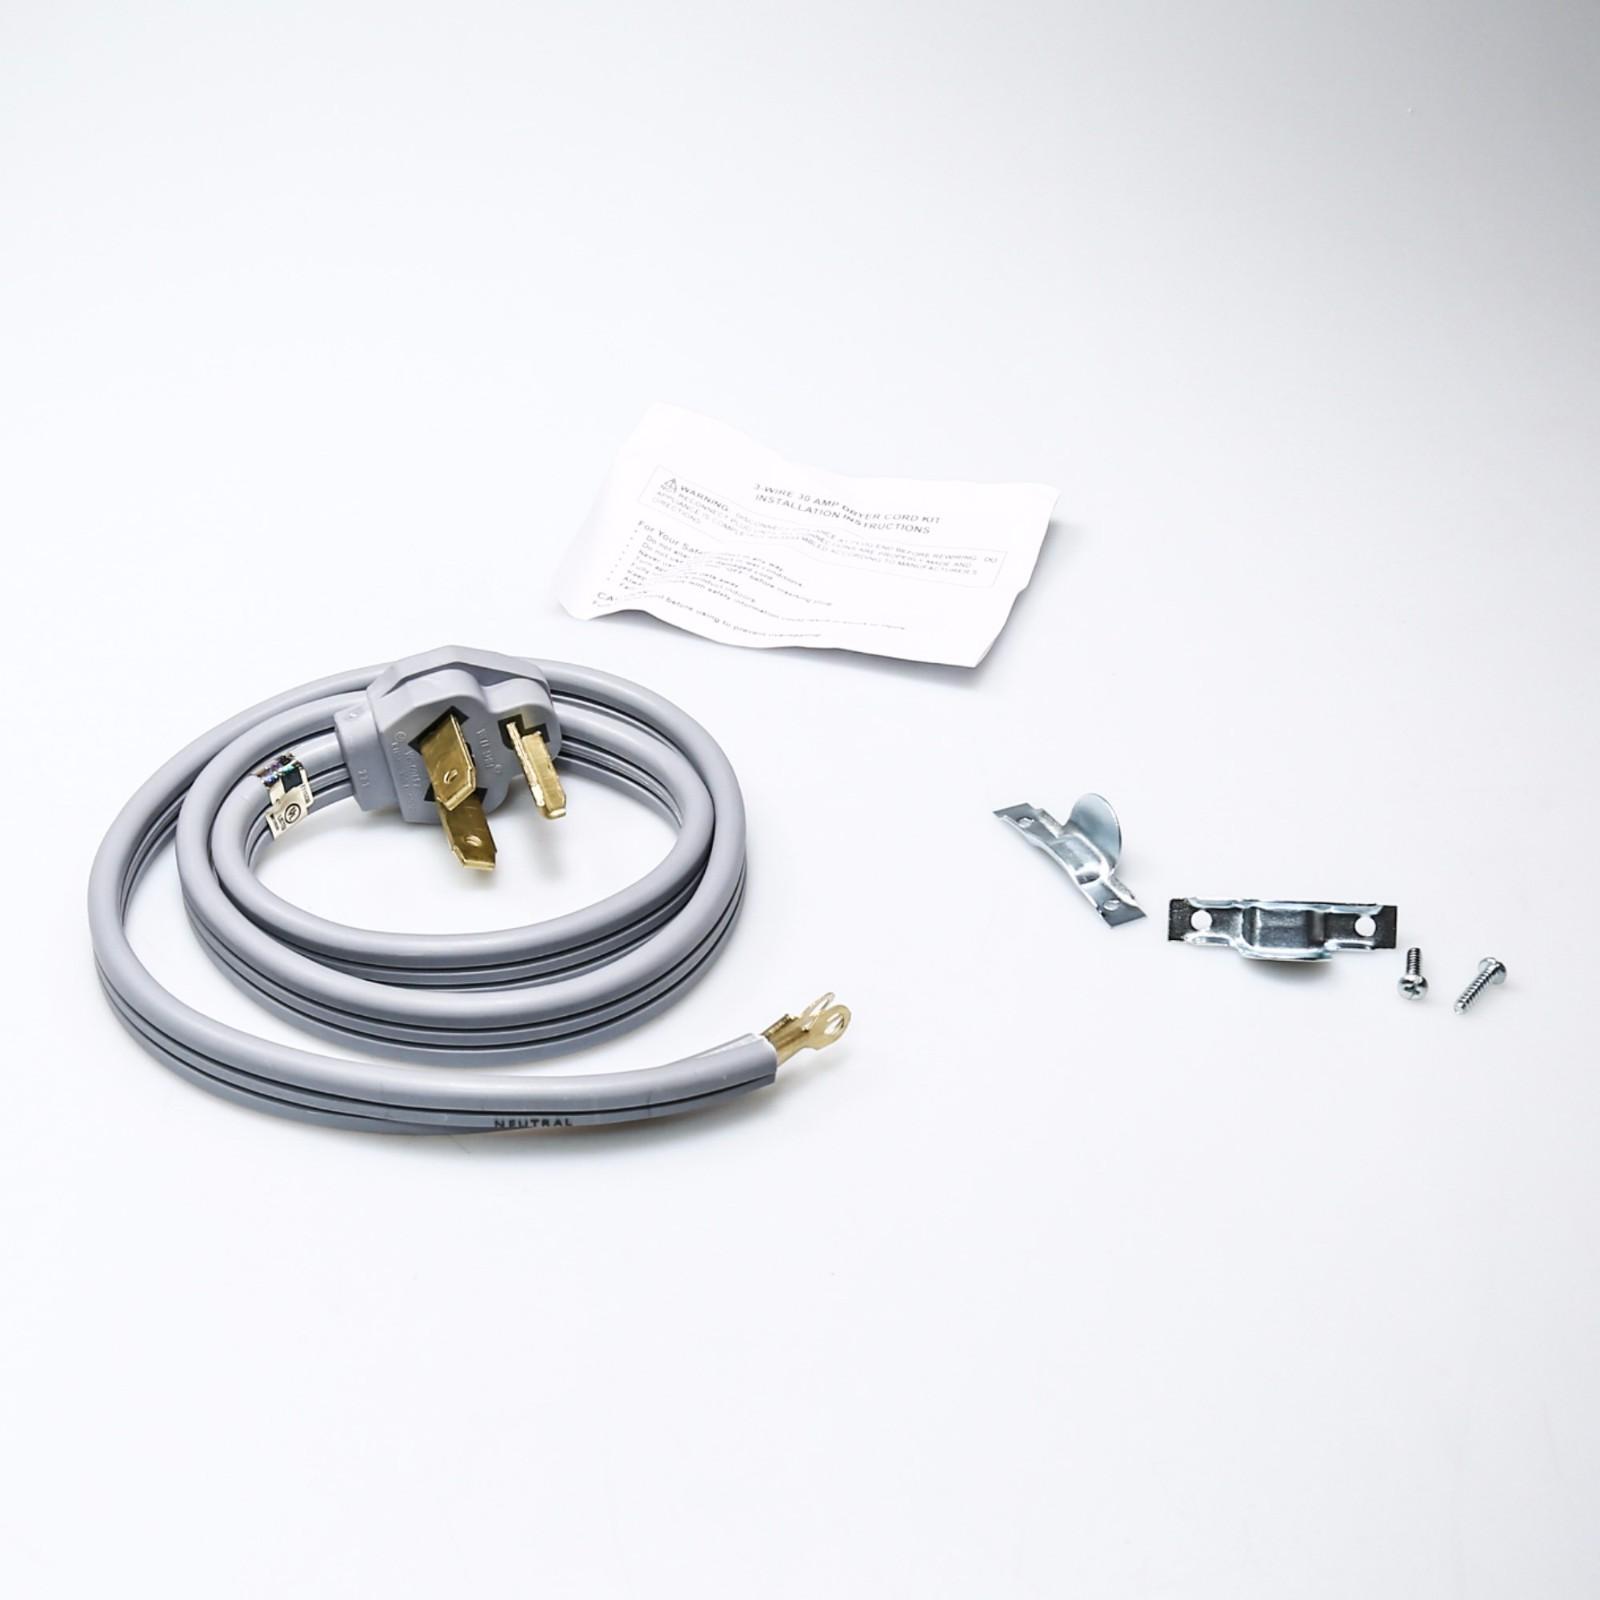 Geh Tj5654 Universal Electric Dryer Power Cord Walmart Com